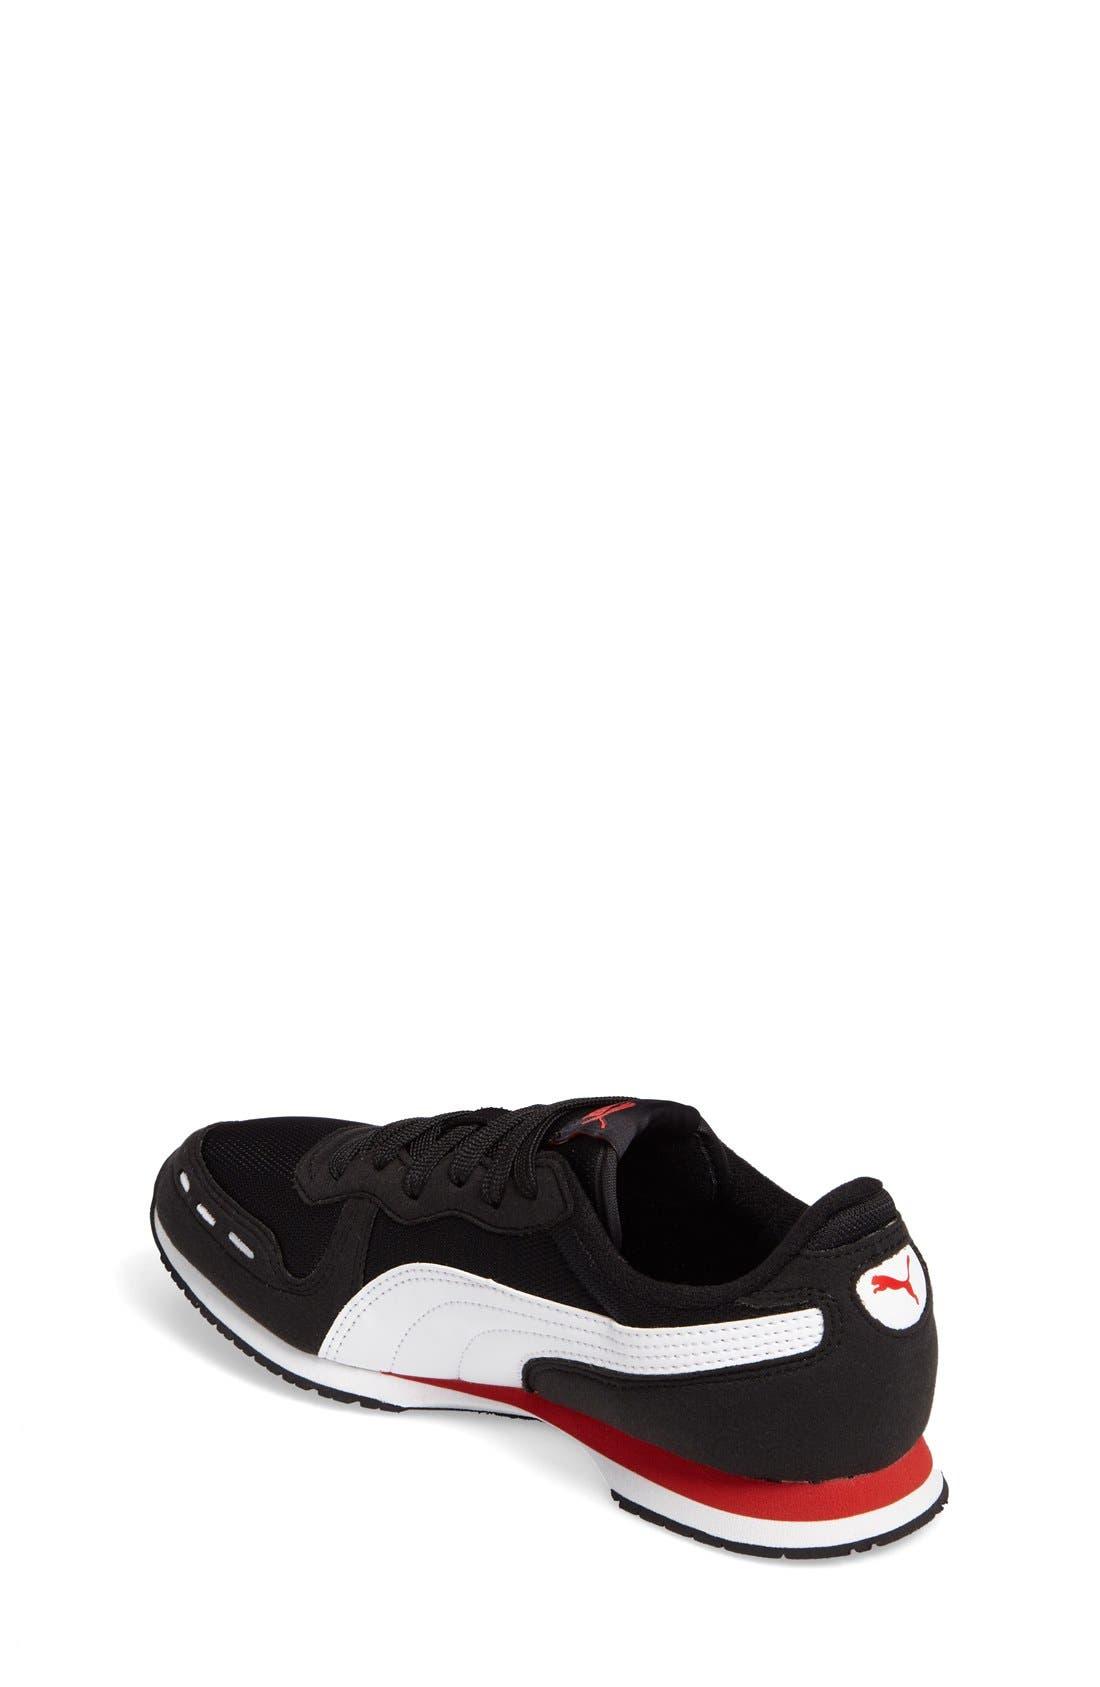 Cabana Racer Sneaker,                             Alternate thumbnail 2, color,                             Puma Black-Puma White